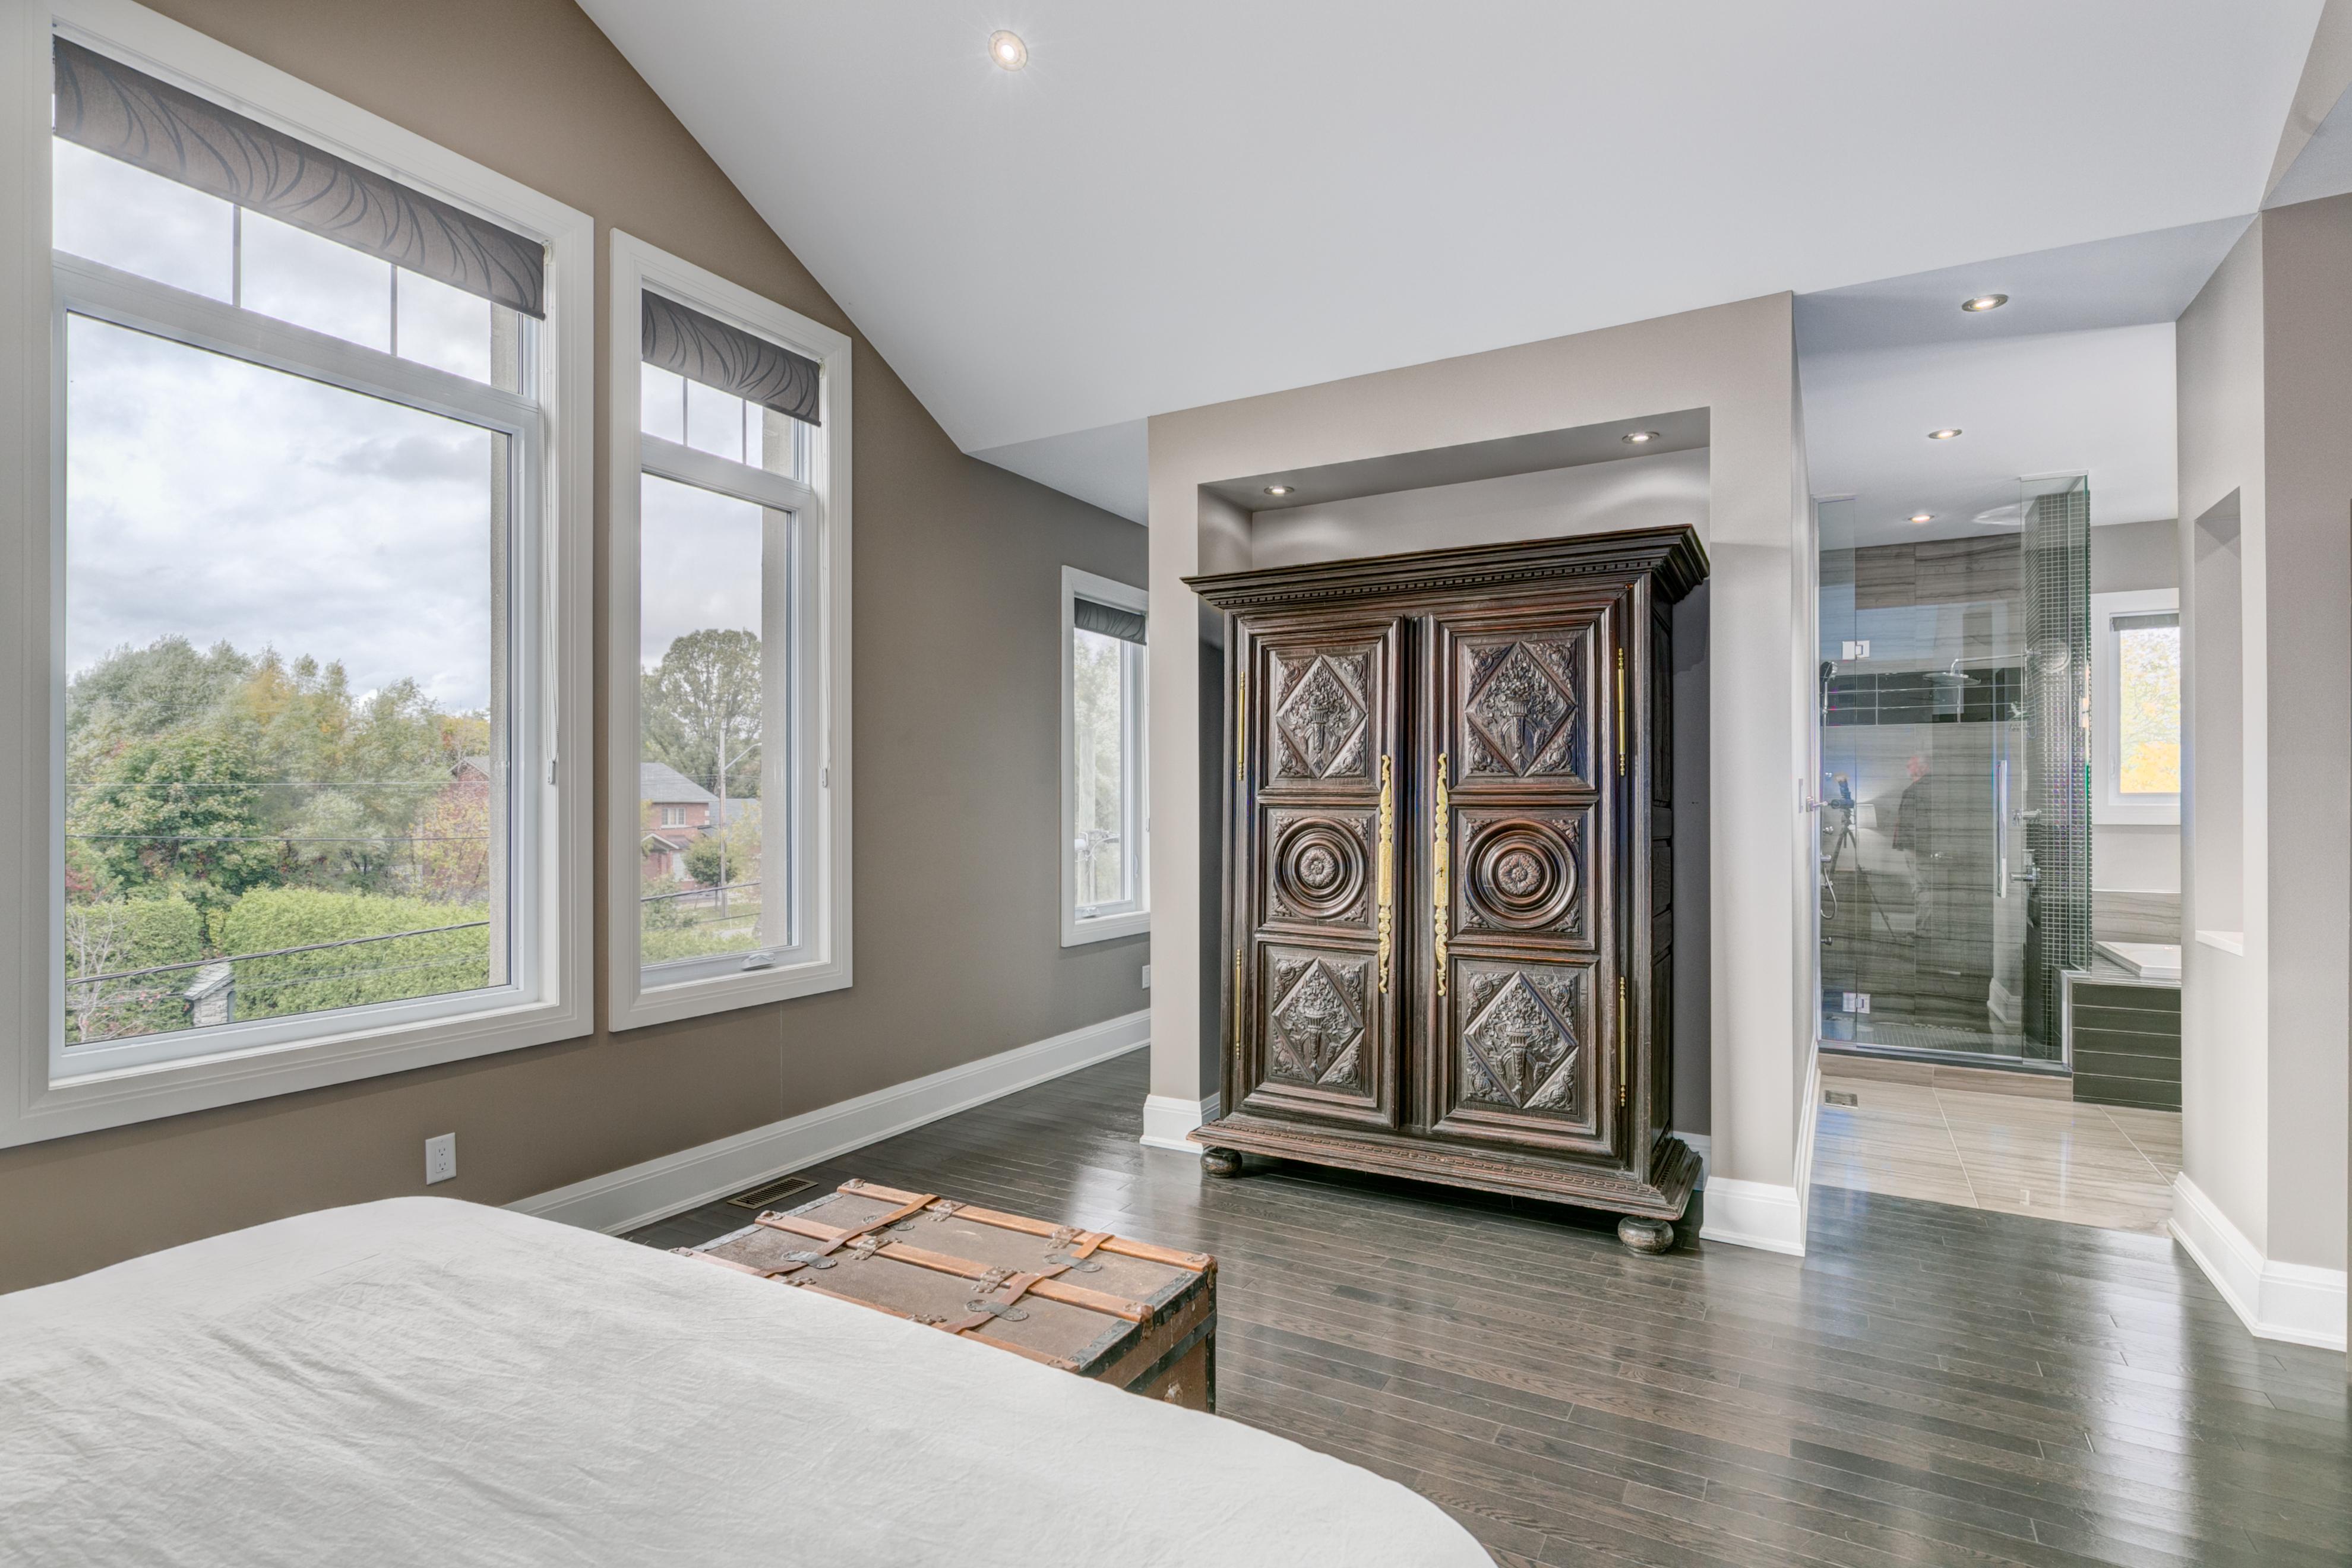 1601 Kingsdale Master Bedroom 2